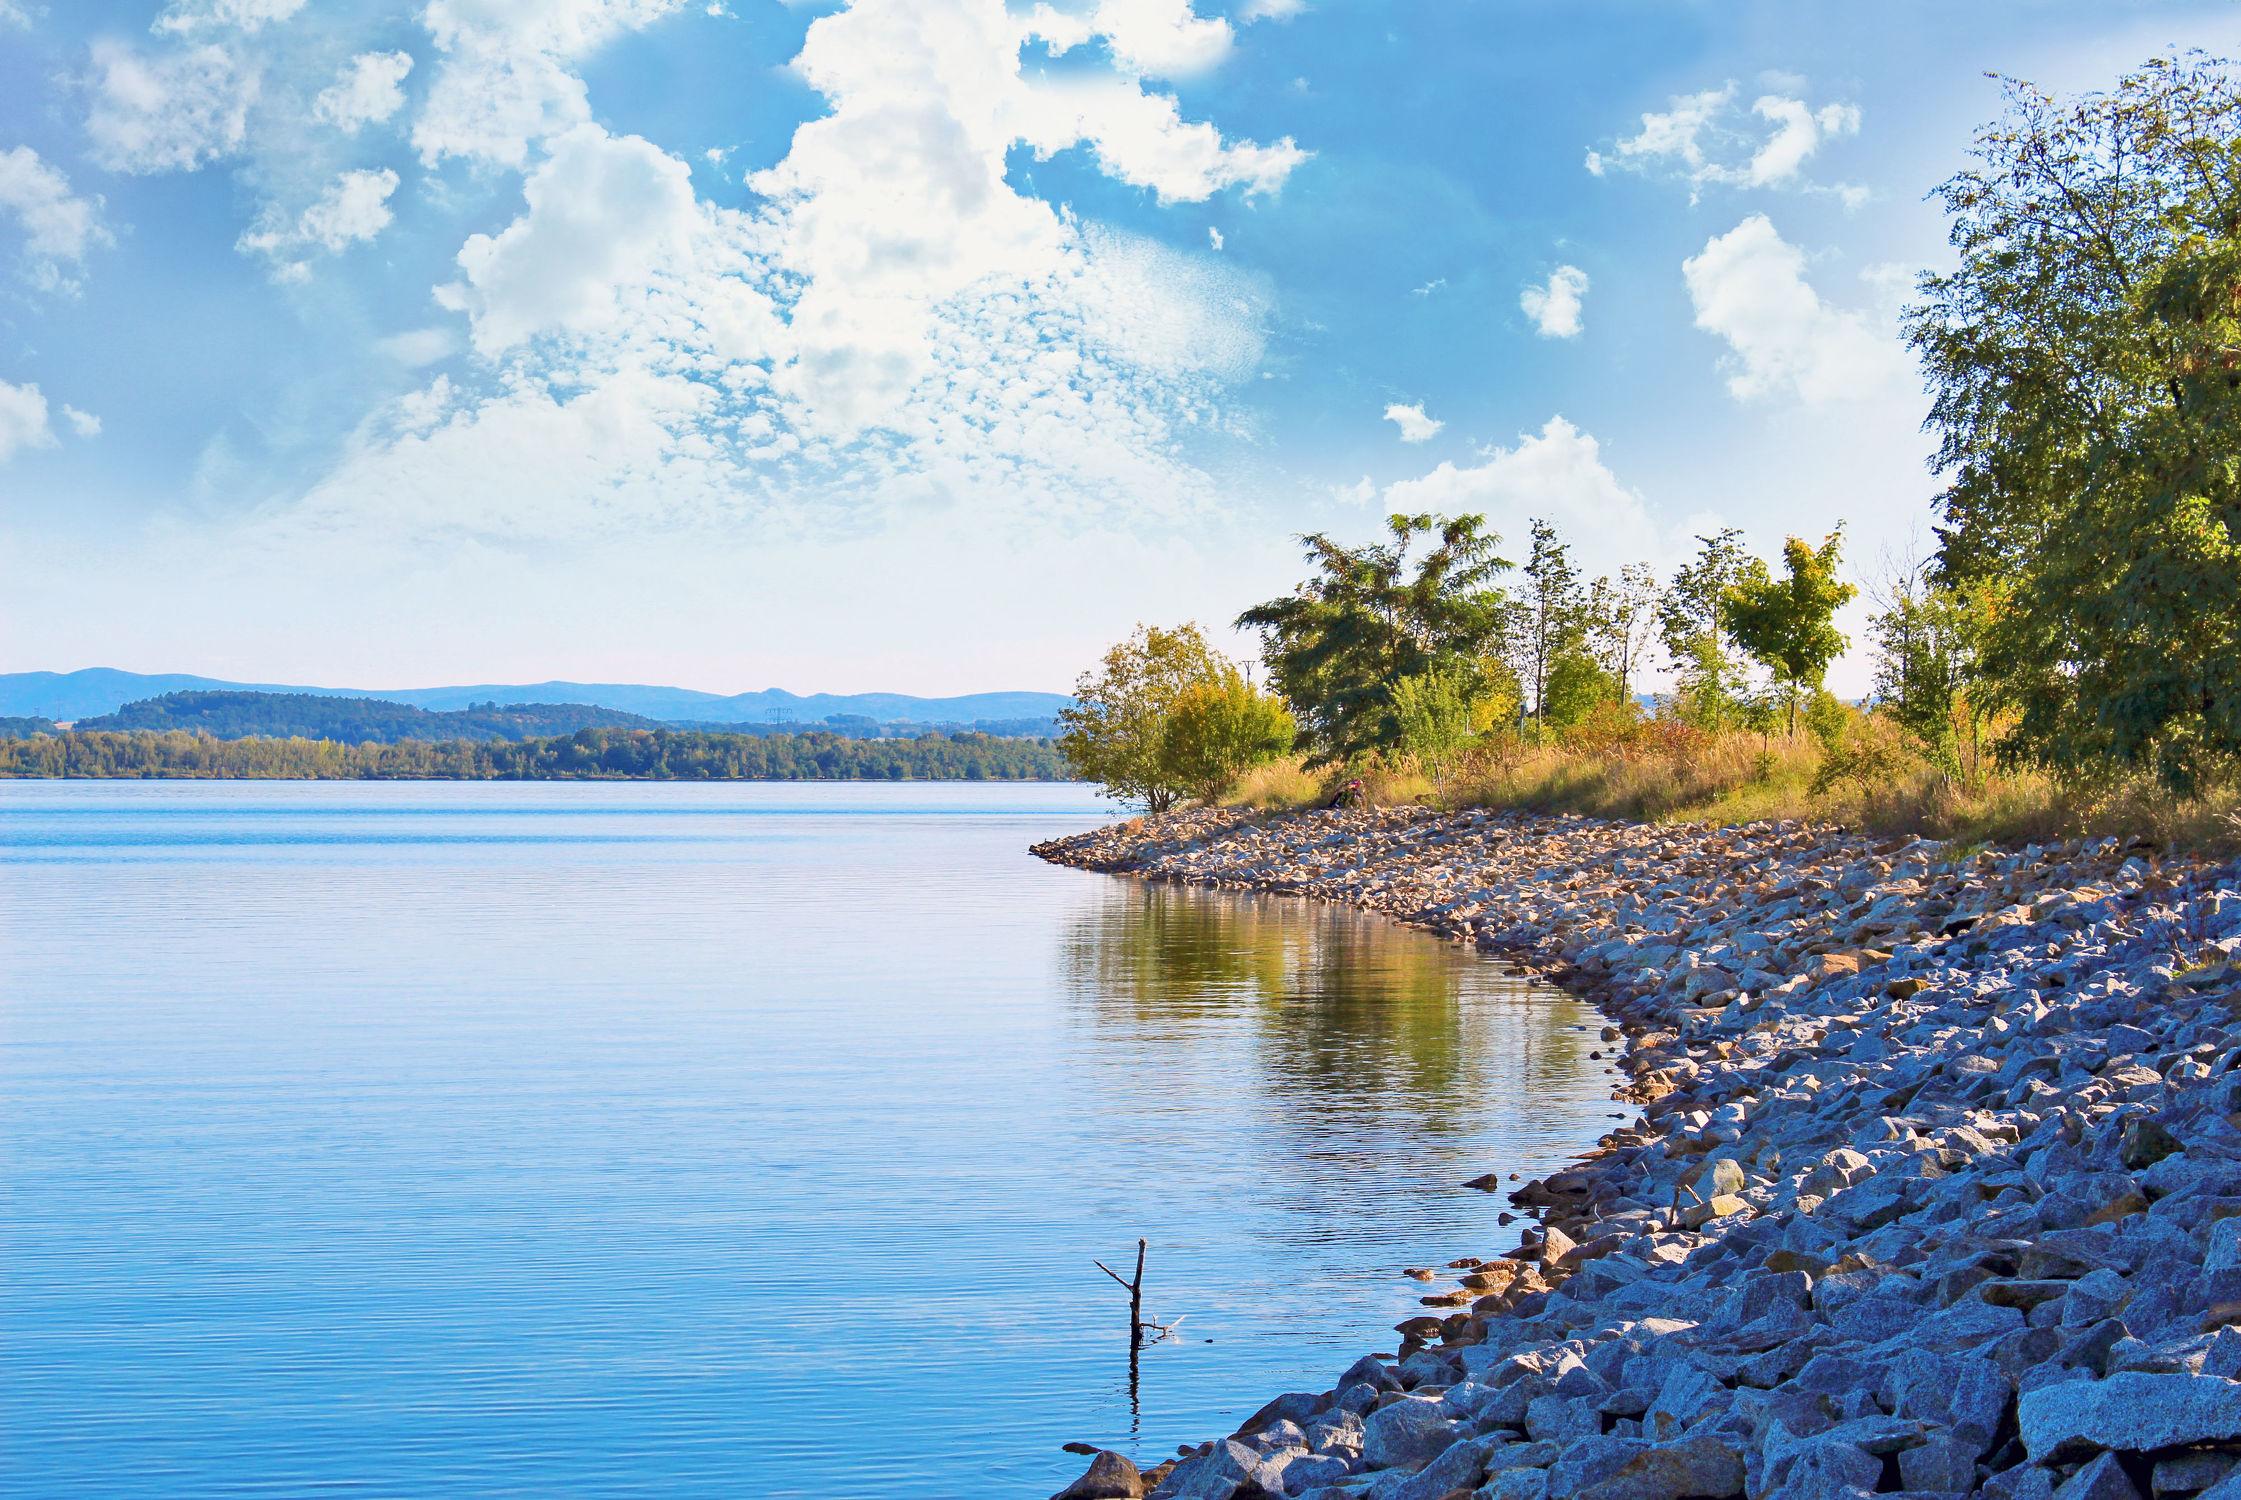 Bild mit Gewässer, Horizont, Wolkenhimmel, Landschaft, Seeblick, See, Berzdorfer See, landscape, Blick über den See